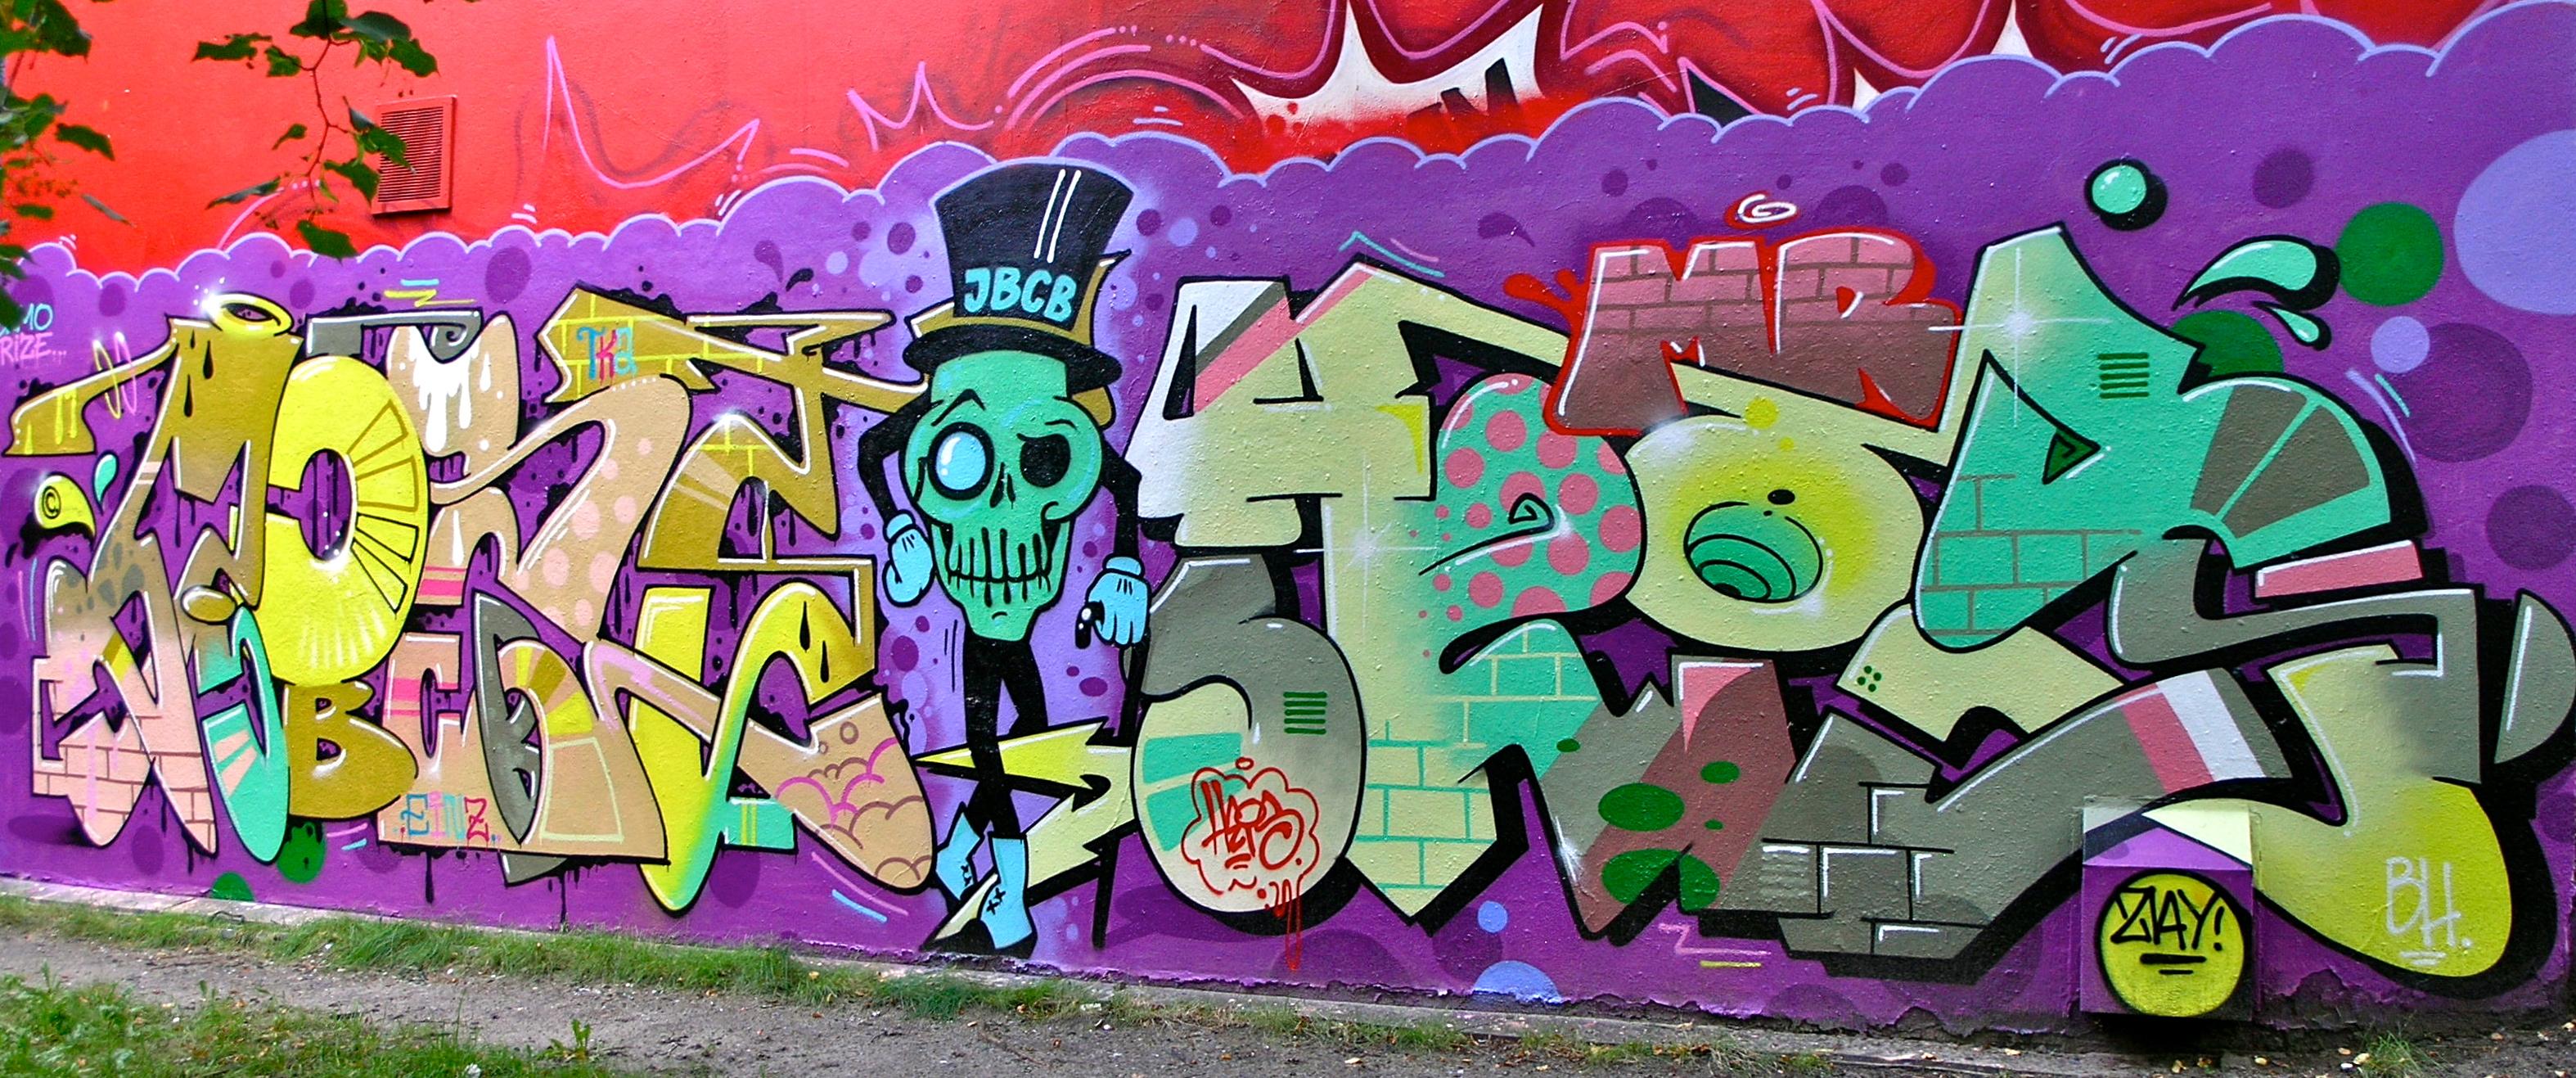 Wallpaper Painting Urban Crew Wall Purple Skull Cowboys Graffiti Skeleton Street Art Pink Writing Can Hamburg Mural Spray Juke ART